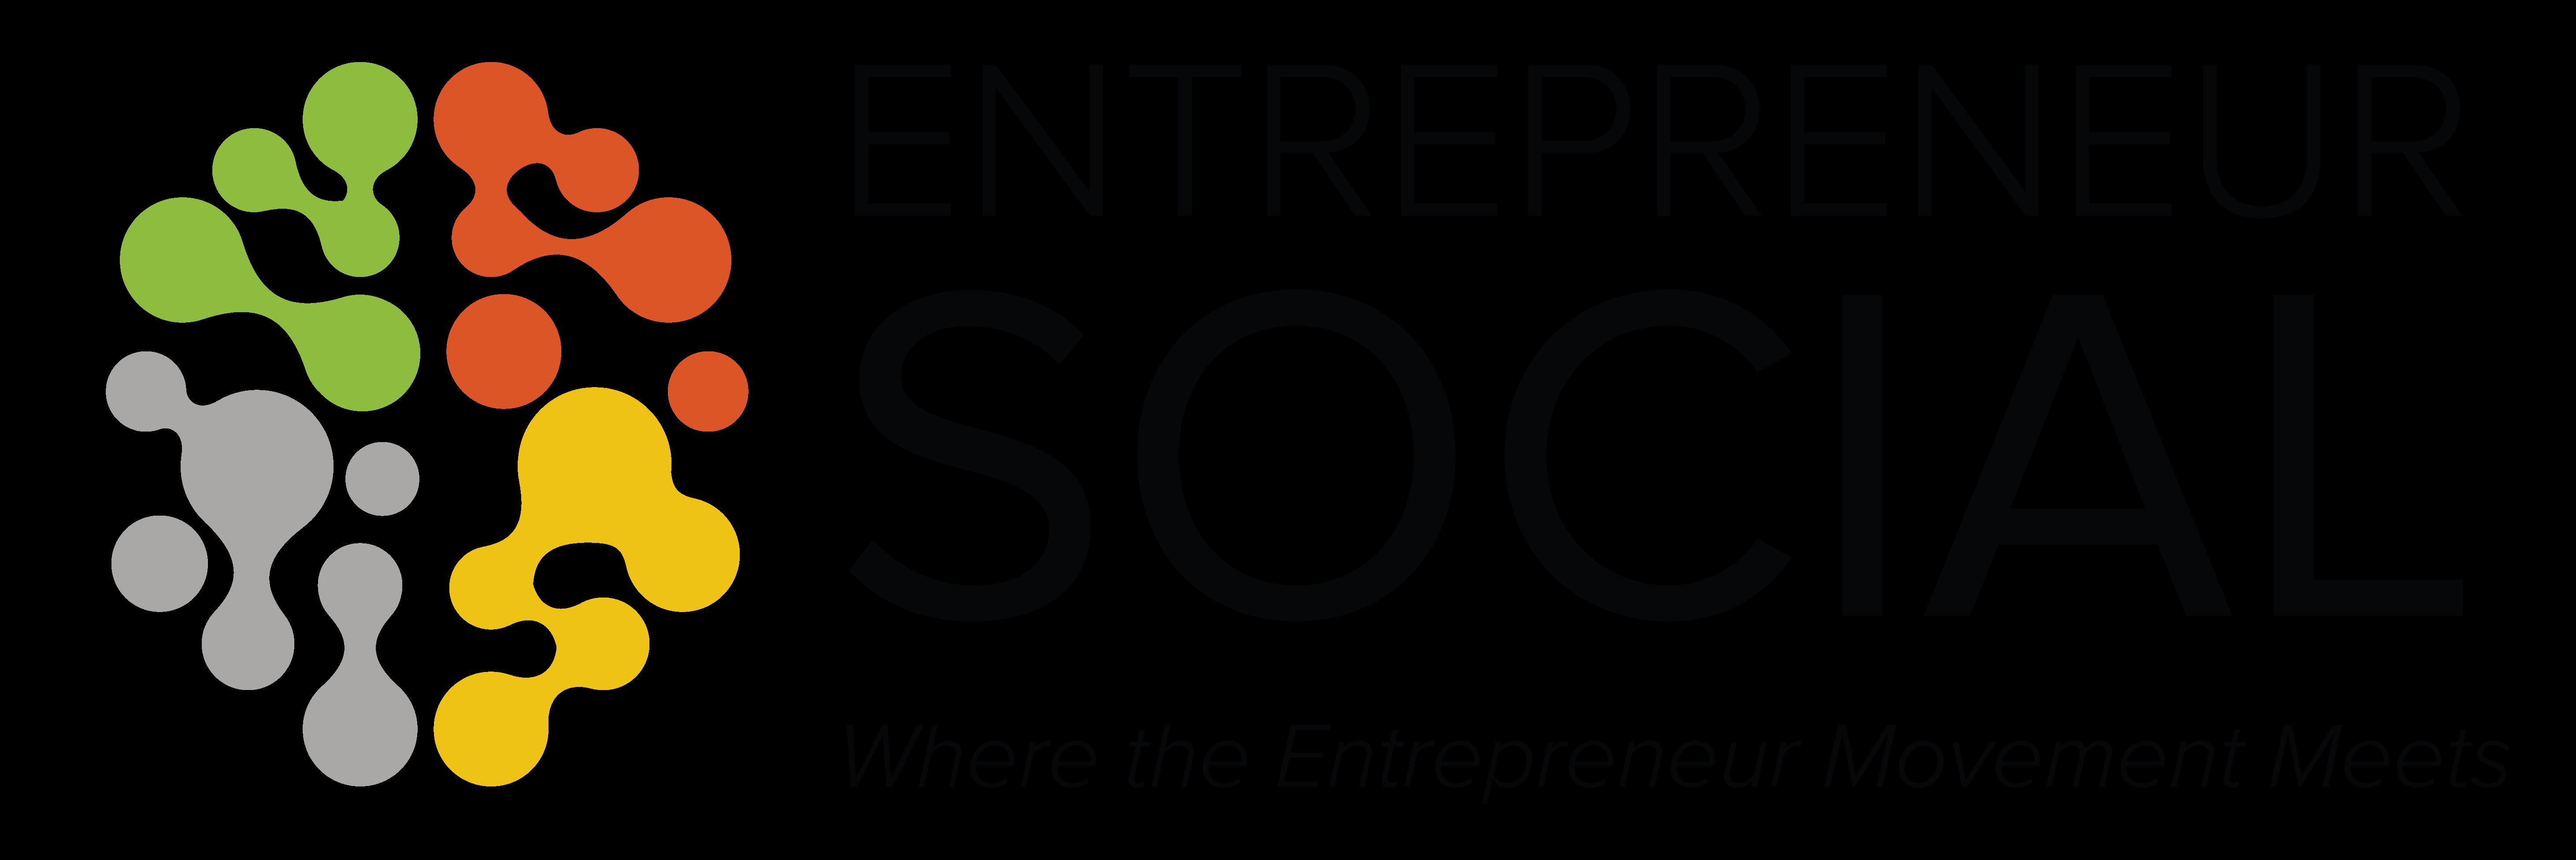 Entreperneur social logo